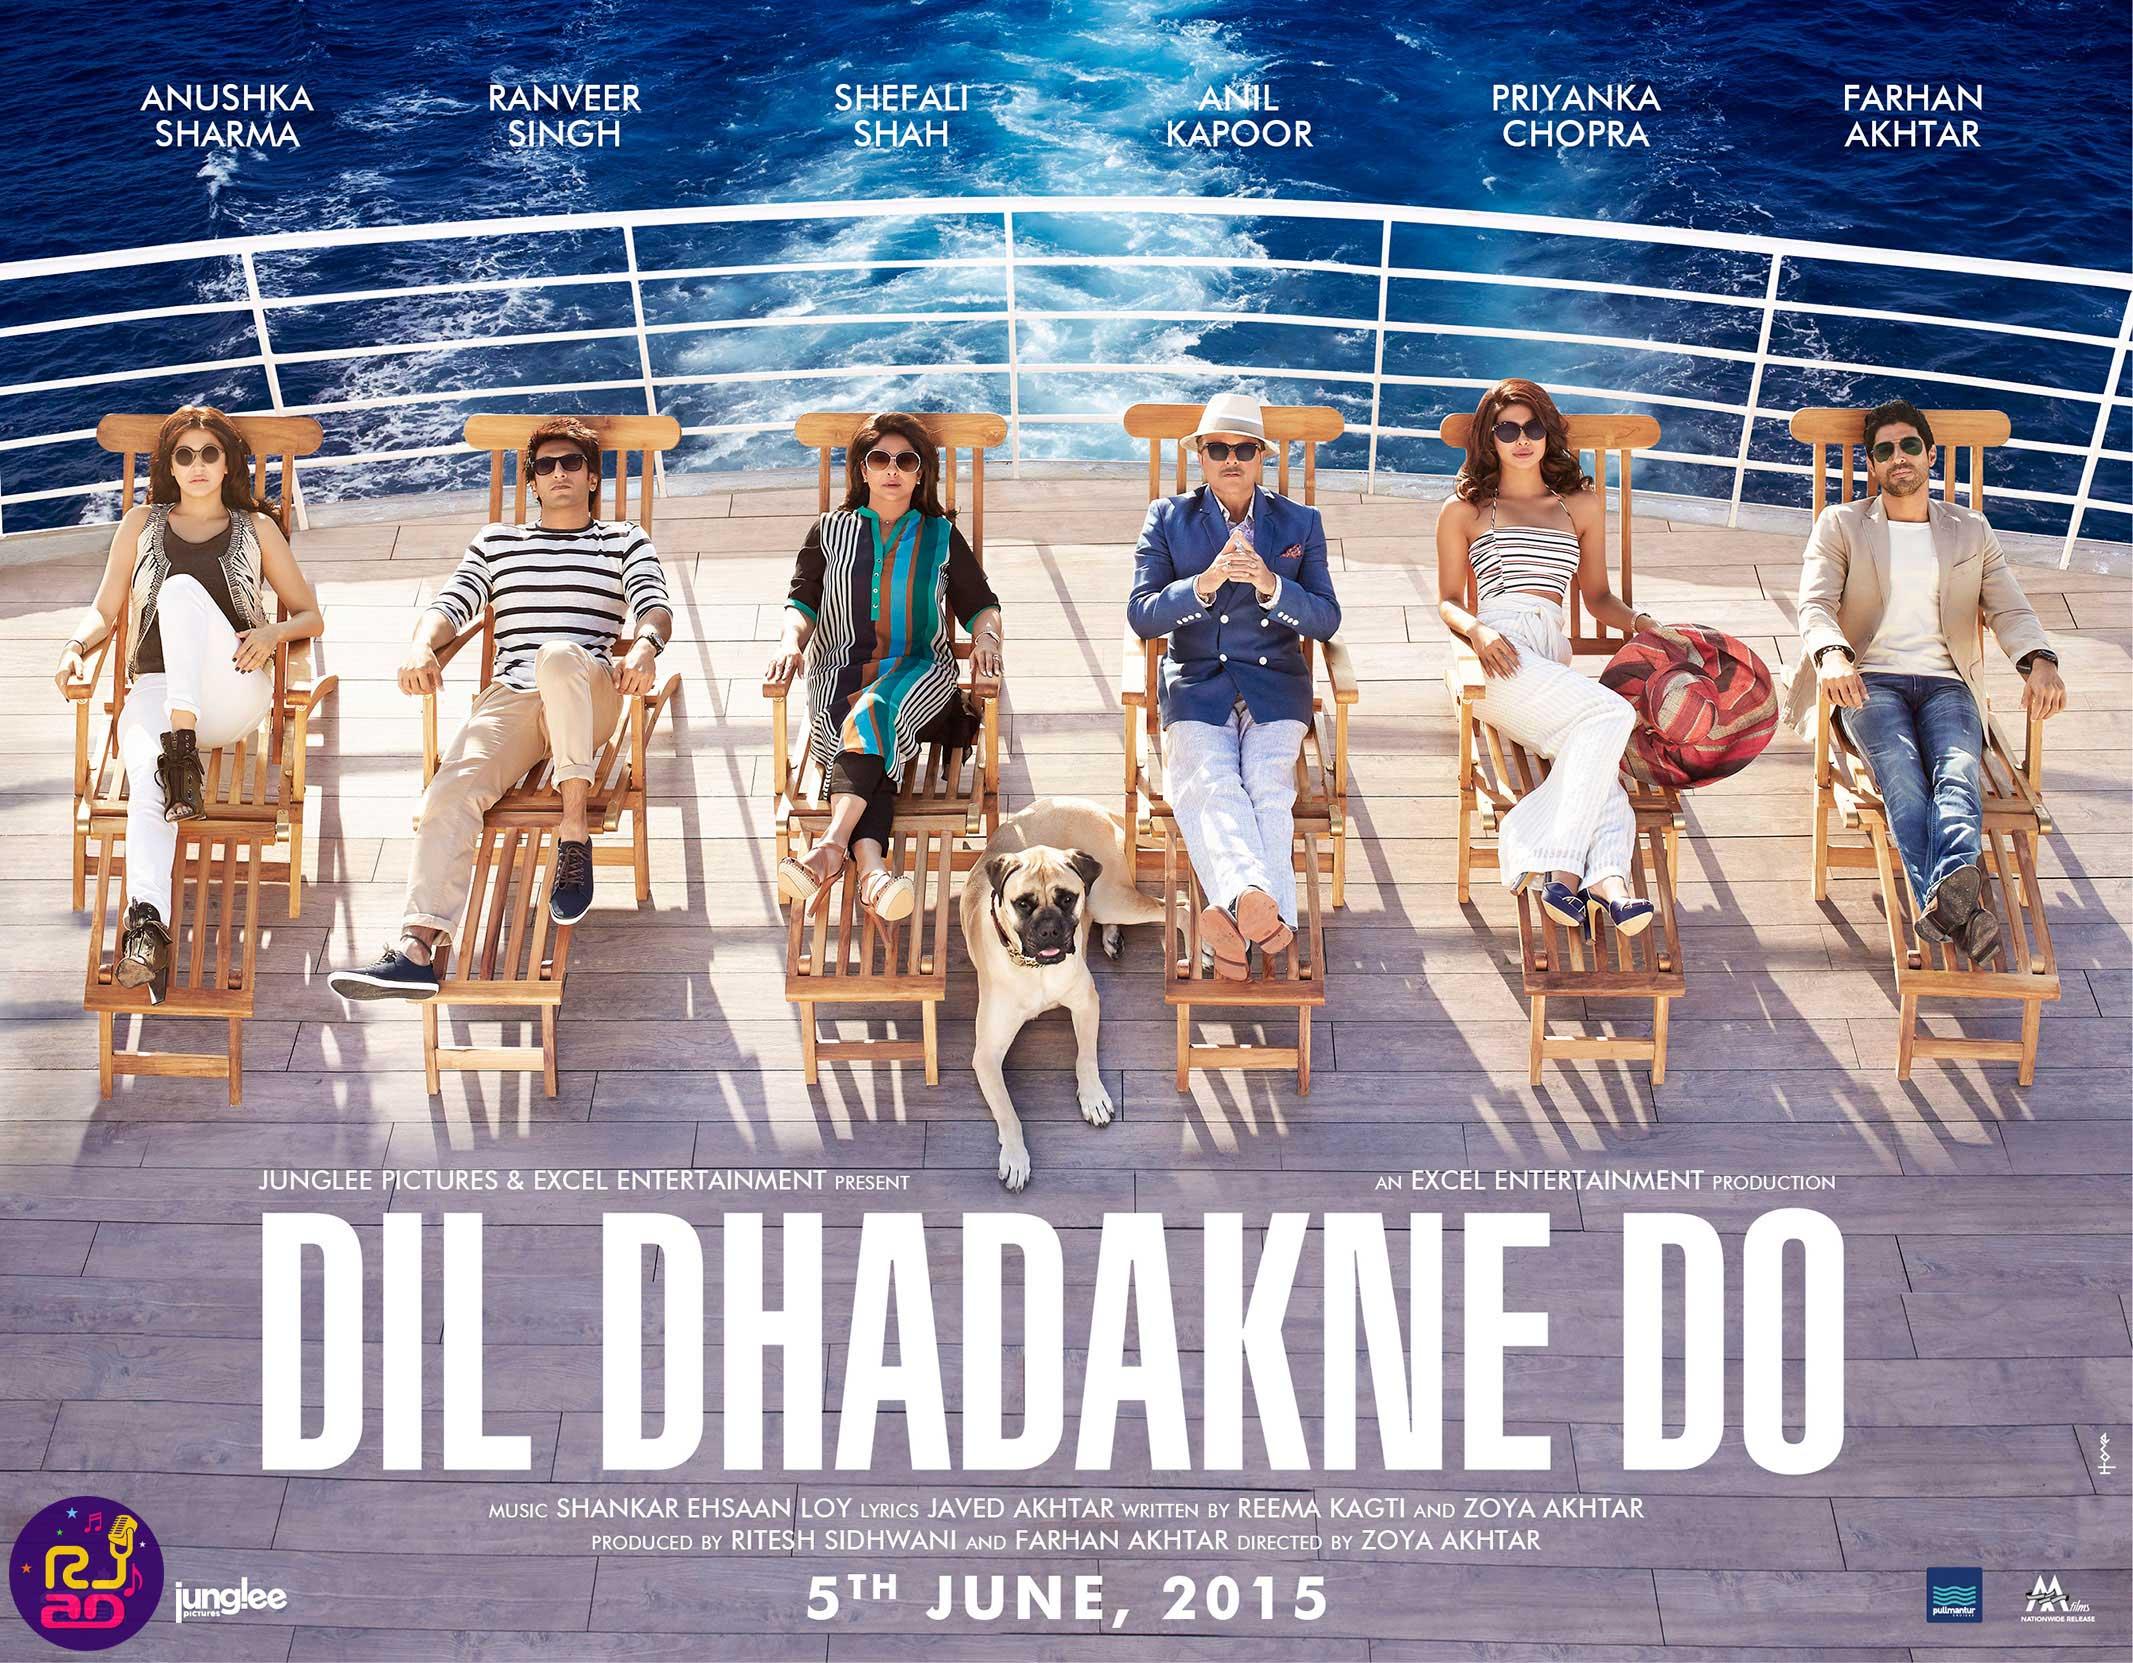 Dil-Dhadakne-Do-poster